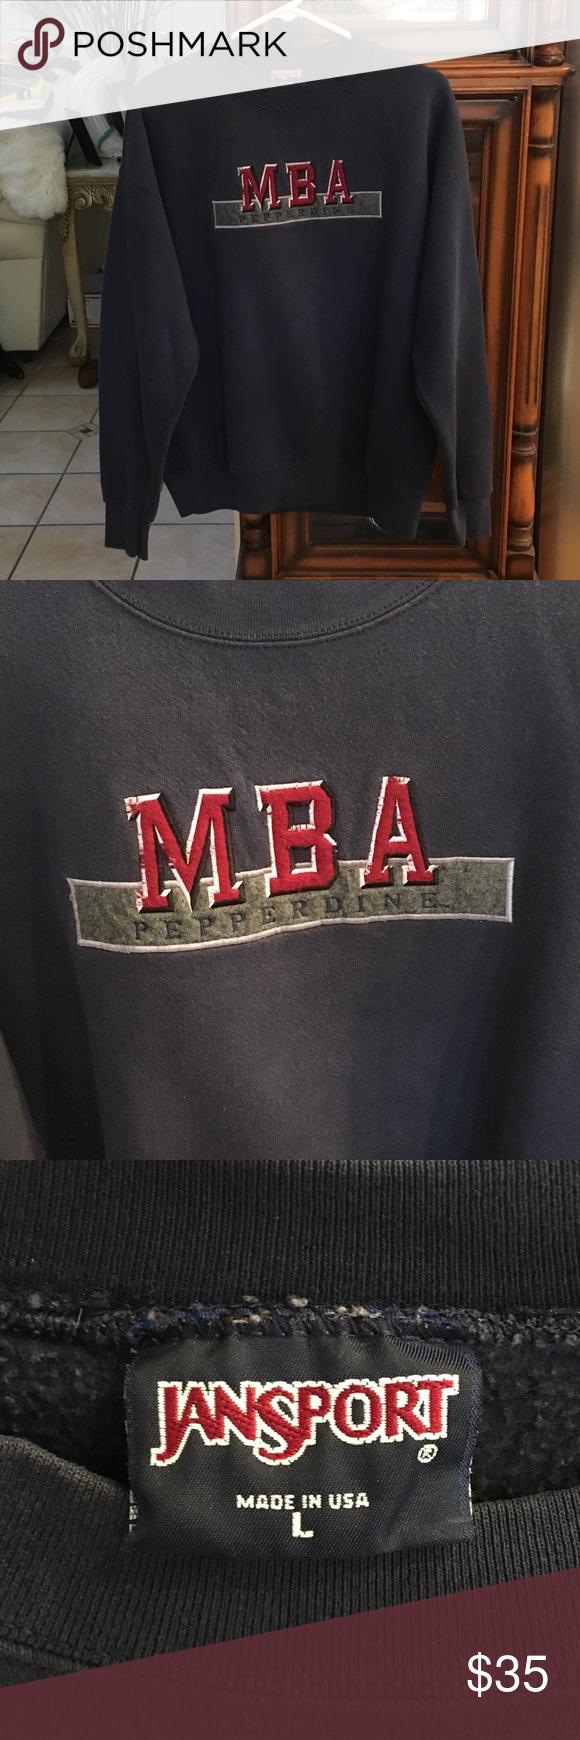 Vintage Pepperdine University Sweatshirt Made in USA